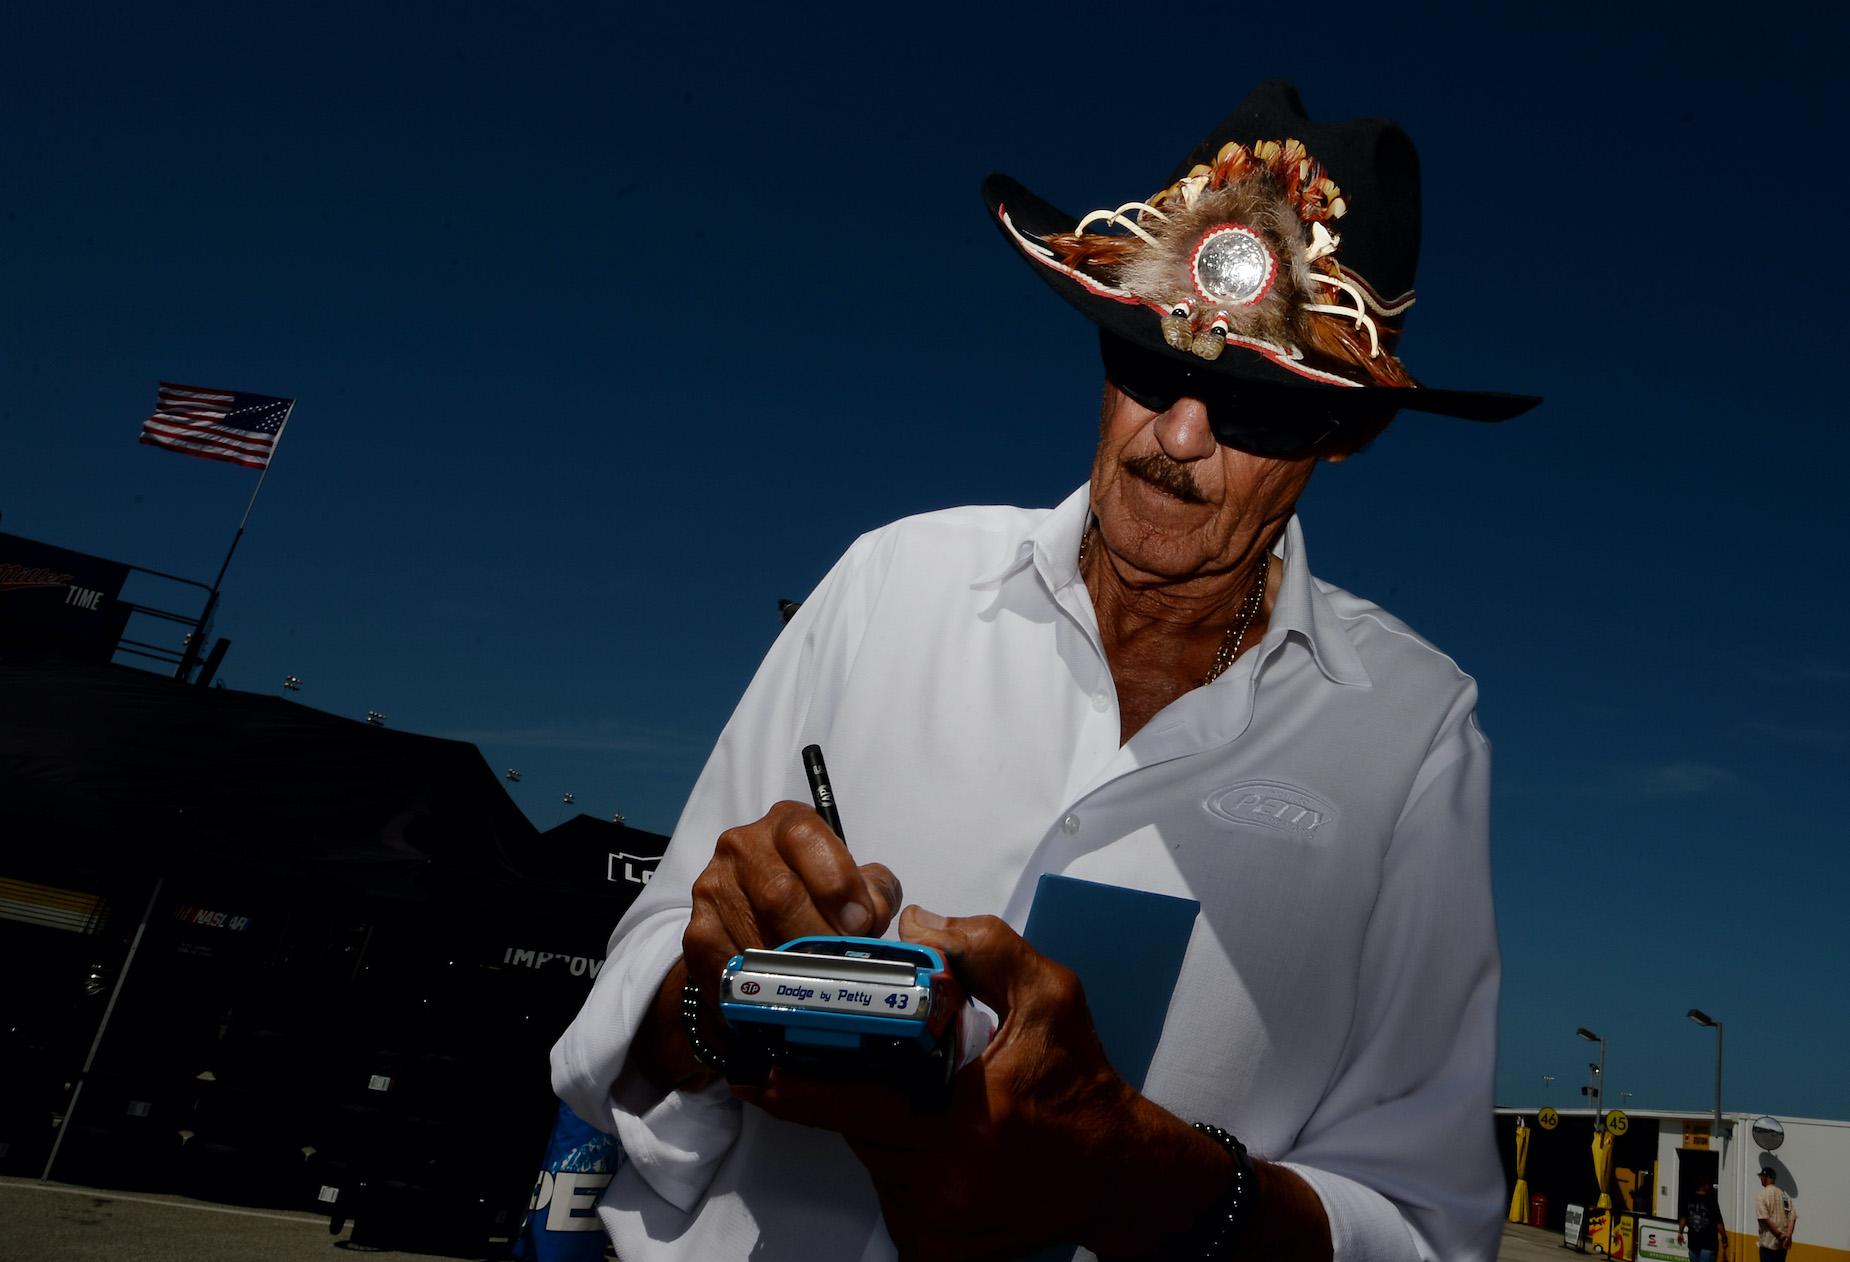 Richard Petty signs an autograph for a NASCAR fan